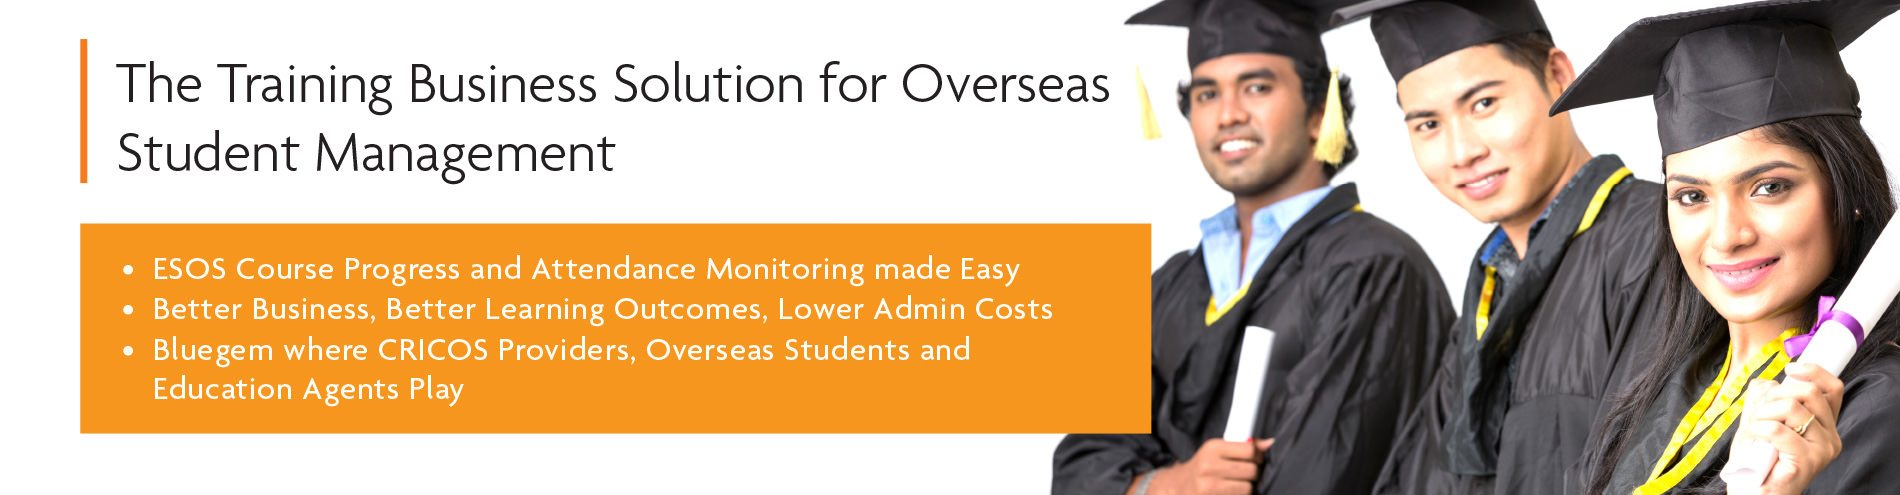 Internation Student Edition for CRICOS Profiders